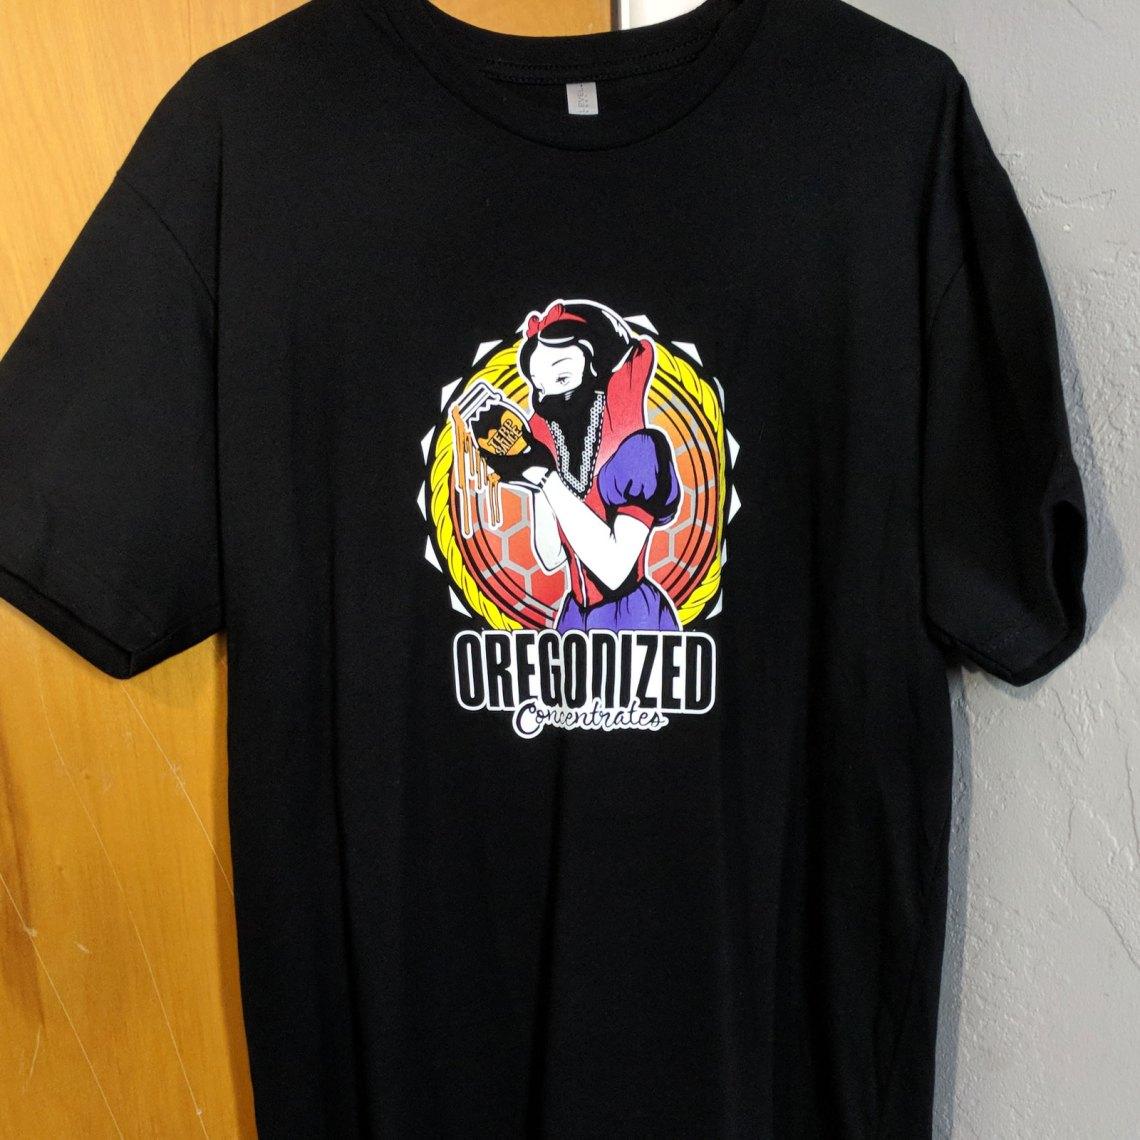 Oregonized Apparel Sauce Princess Tshirt